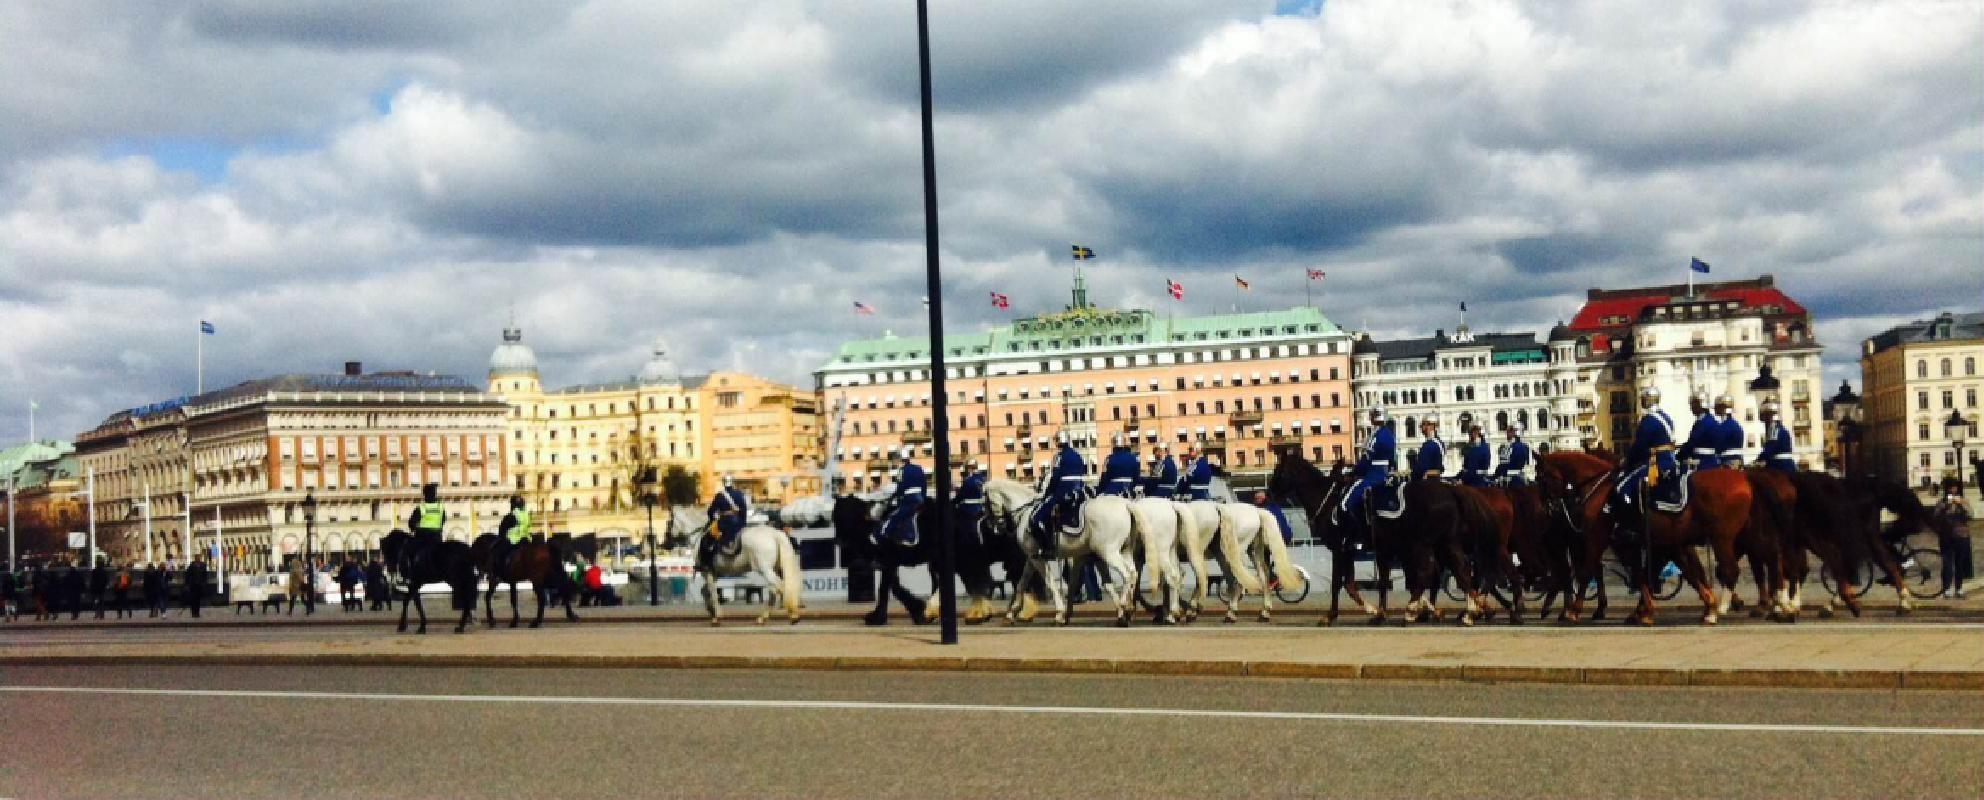 Stockholm Swedish Cuisine Food Tasting and Walking Tour